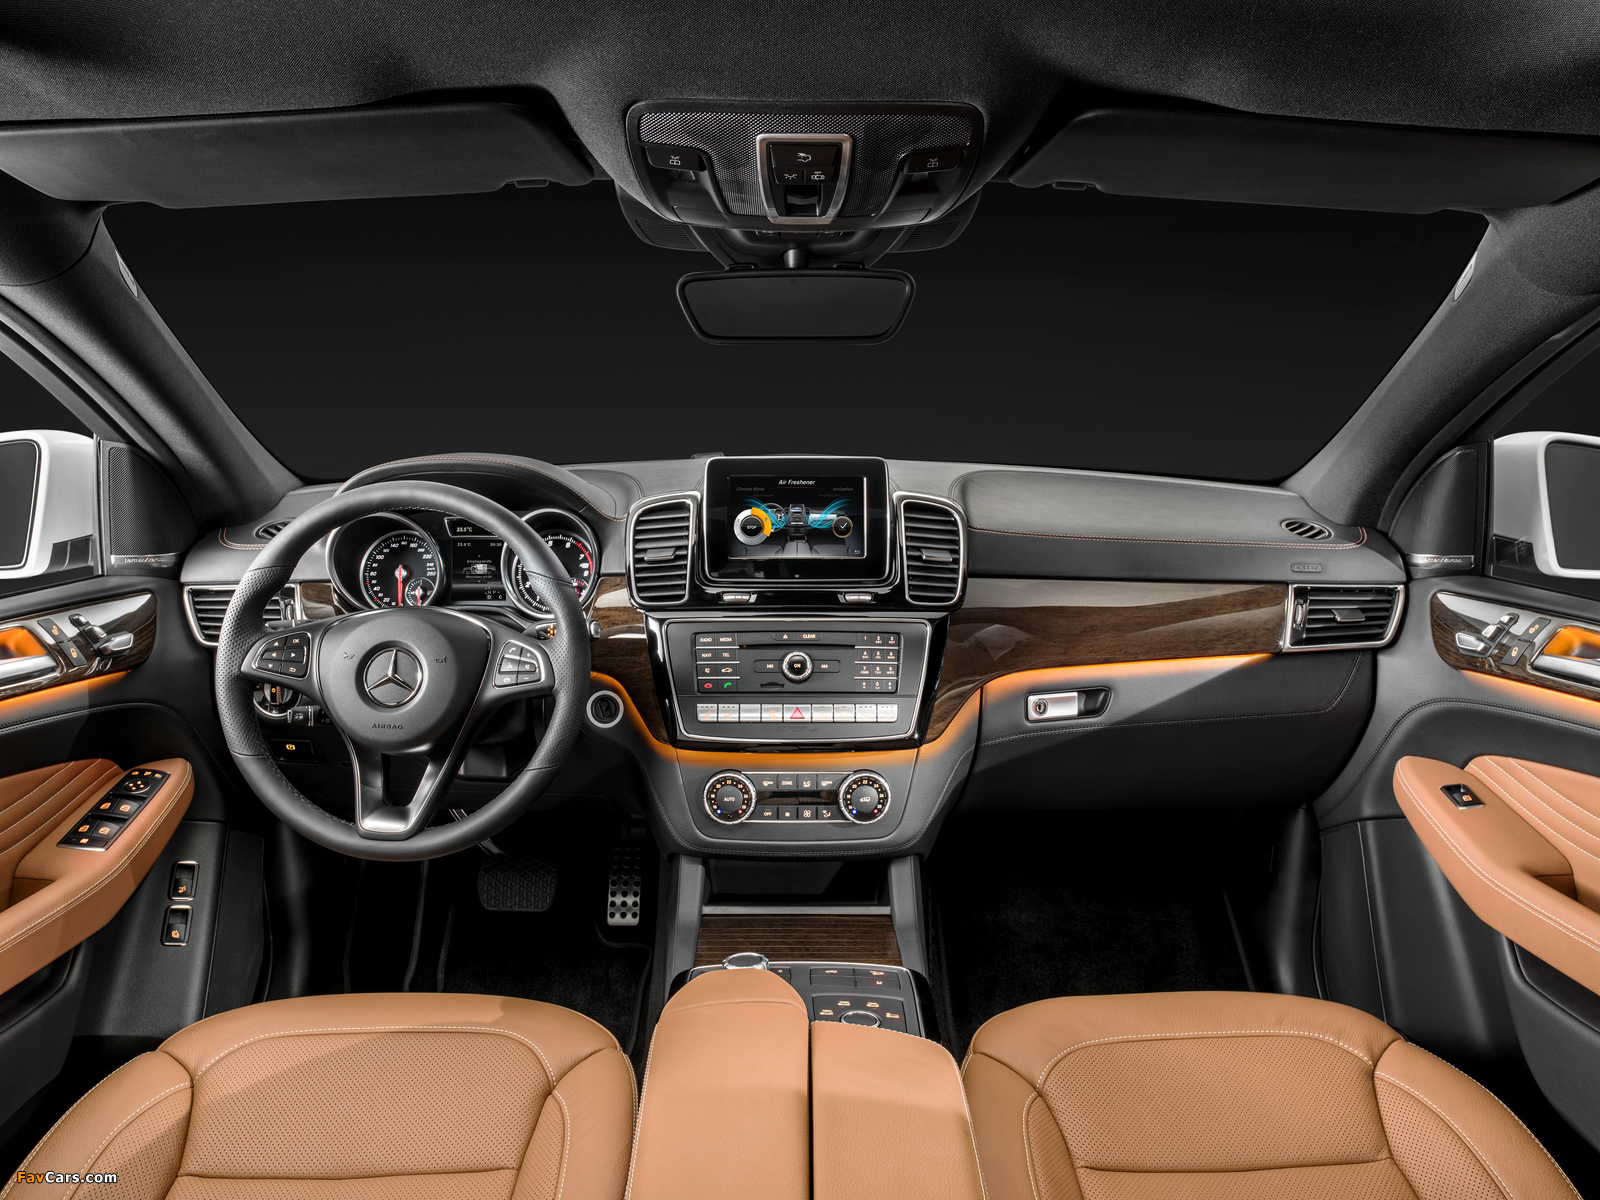 Mercedes-Benz GLE 400 4MATIC Coupé (C292) 2015 pictures (1600 x 1200)